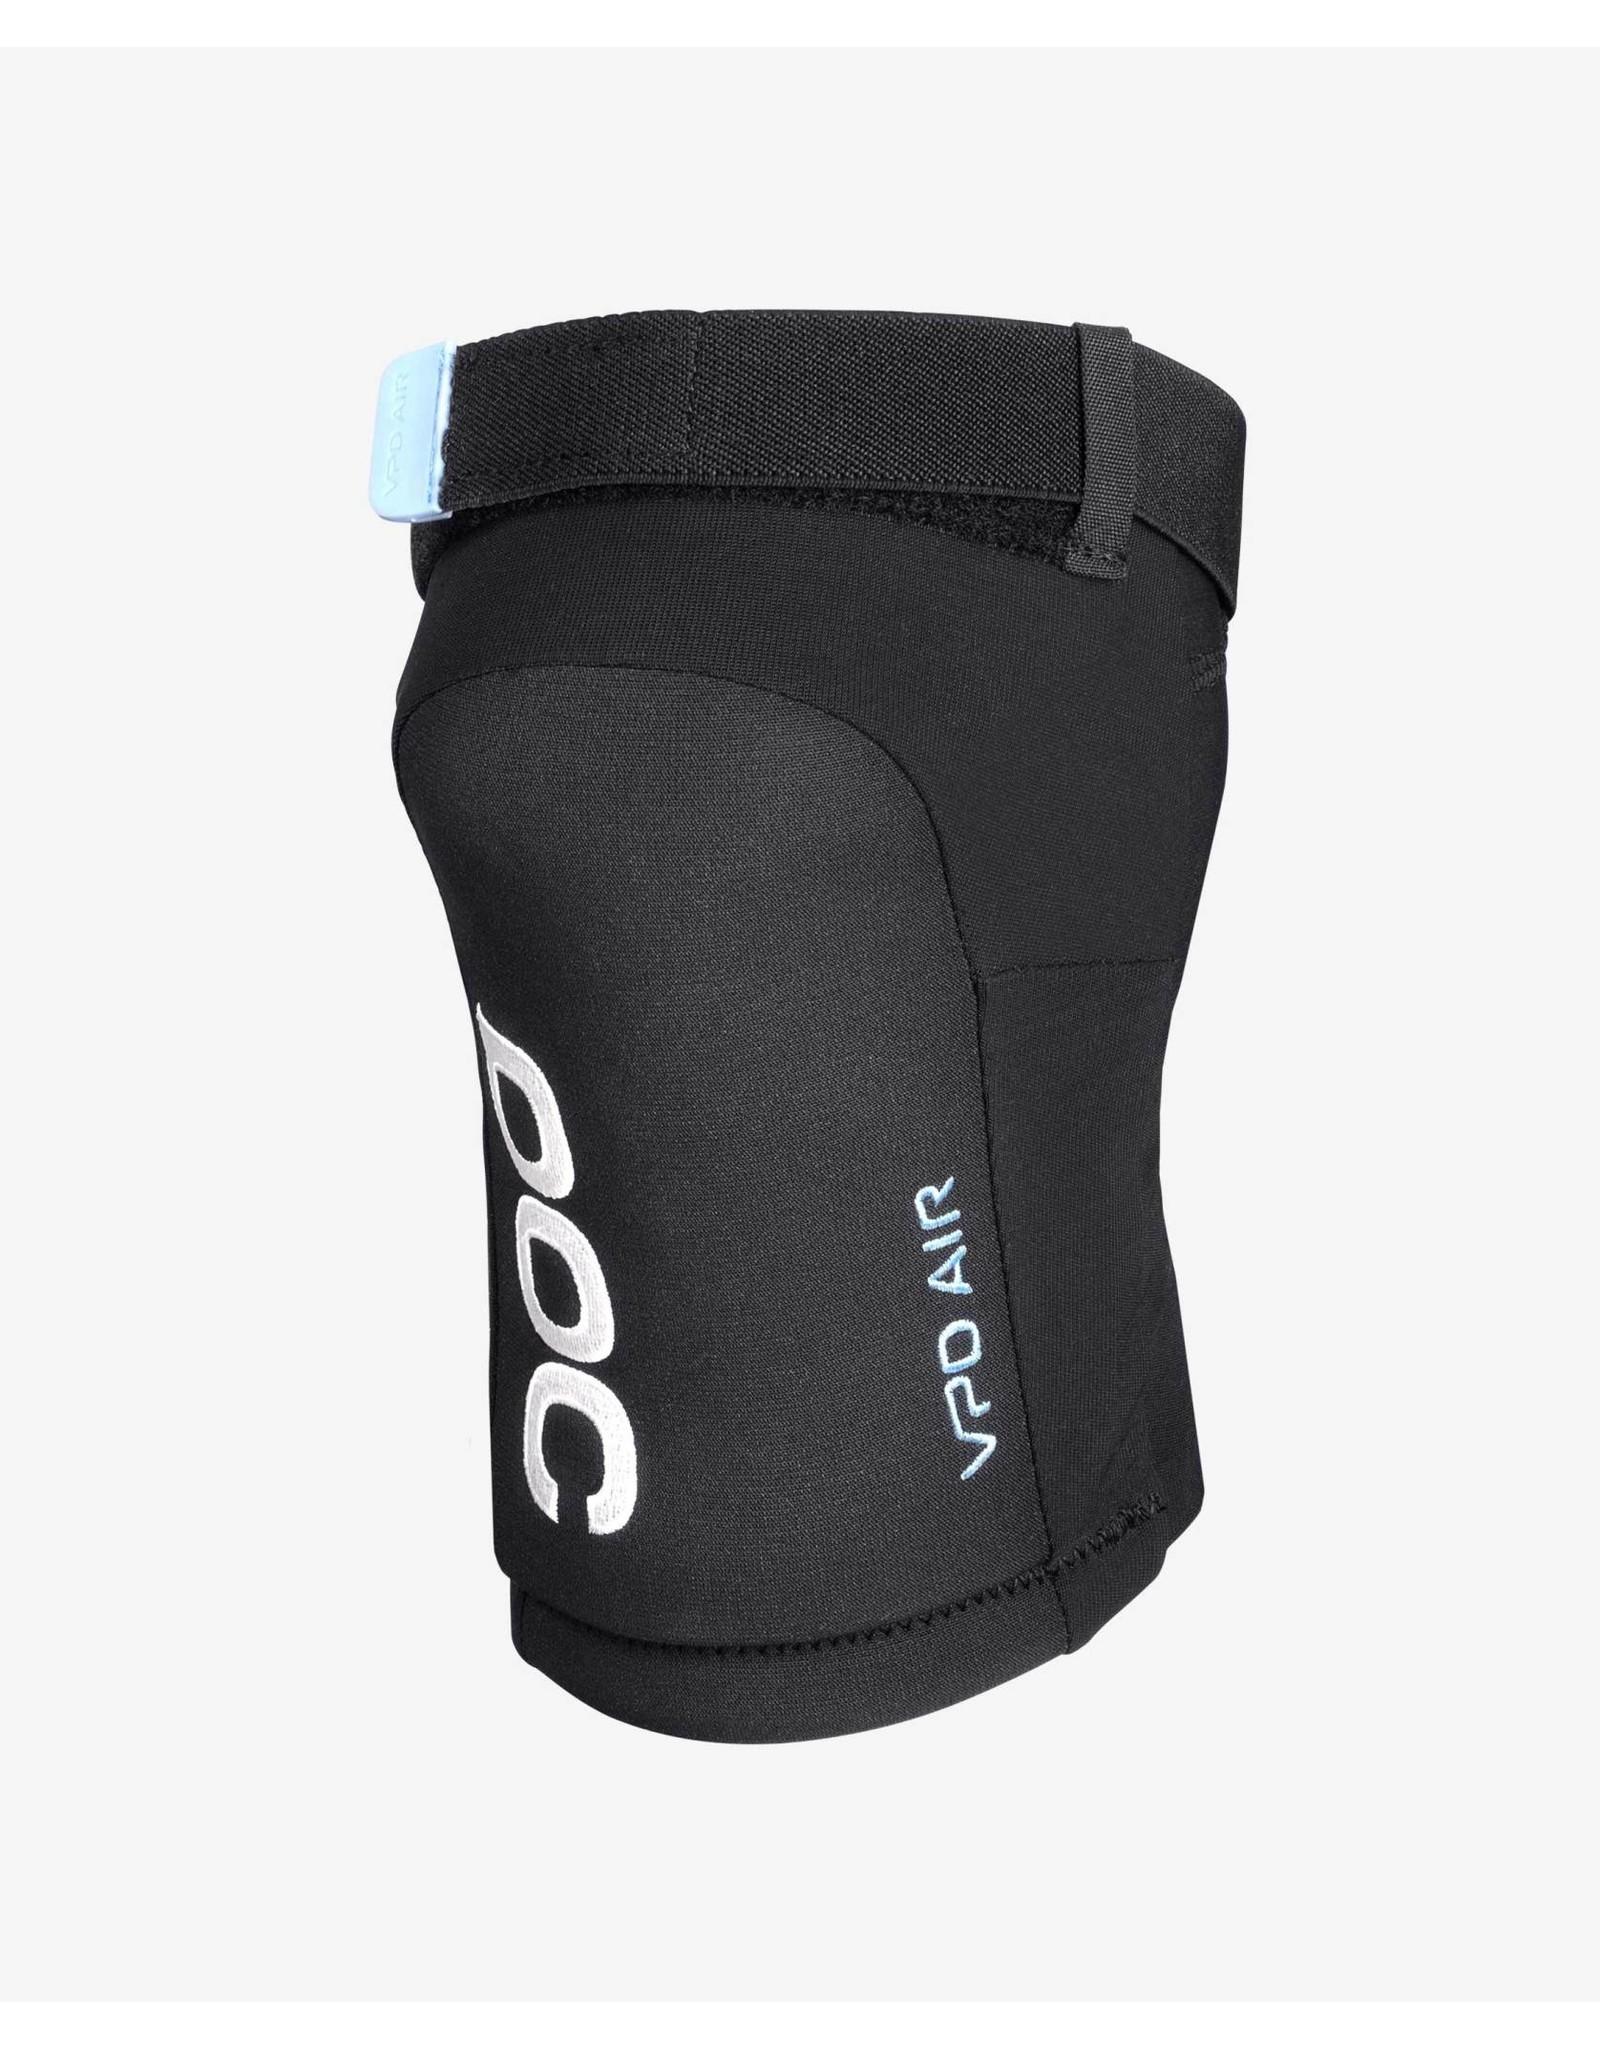 POC POC VPD Air Knee Pads